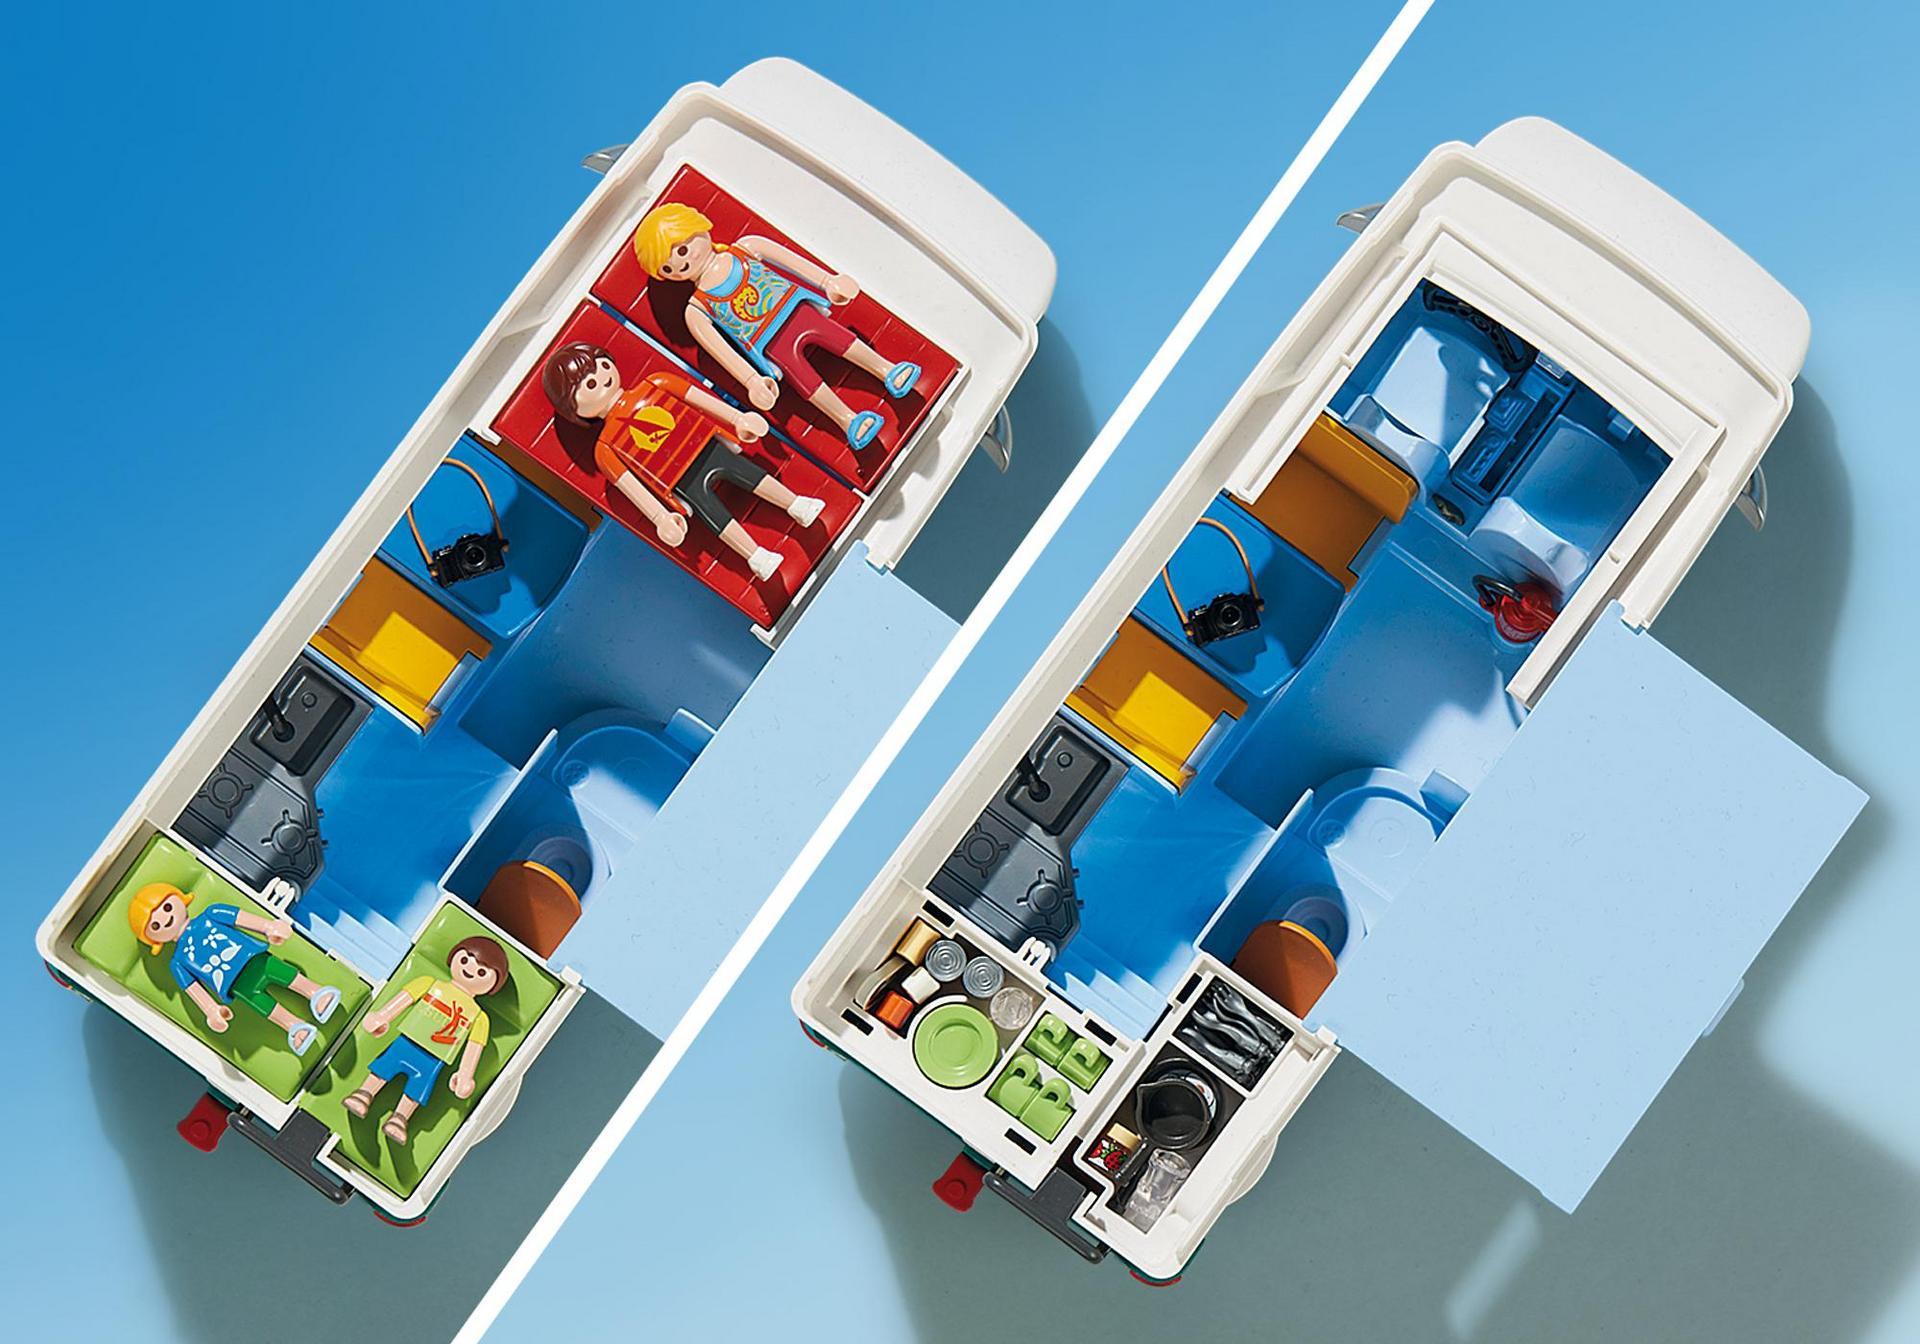 Ausmalbilder Playmobil Schwimmbad : Fein Playmobil Aquapark Ausmalbilder Galerie Malvorlagen Ideen